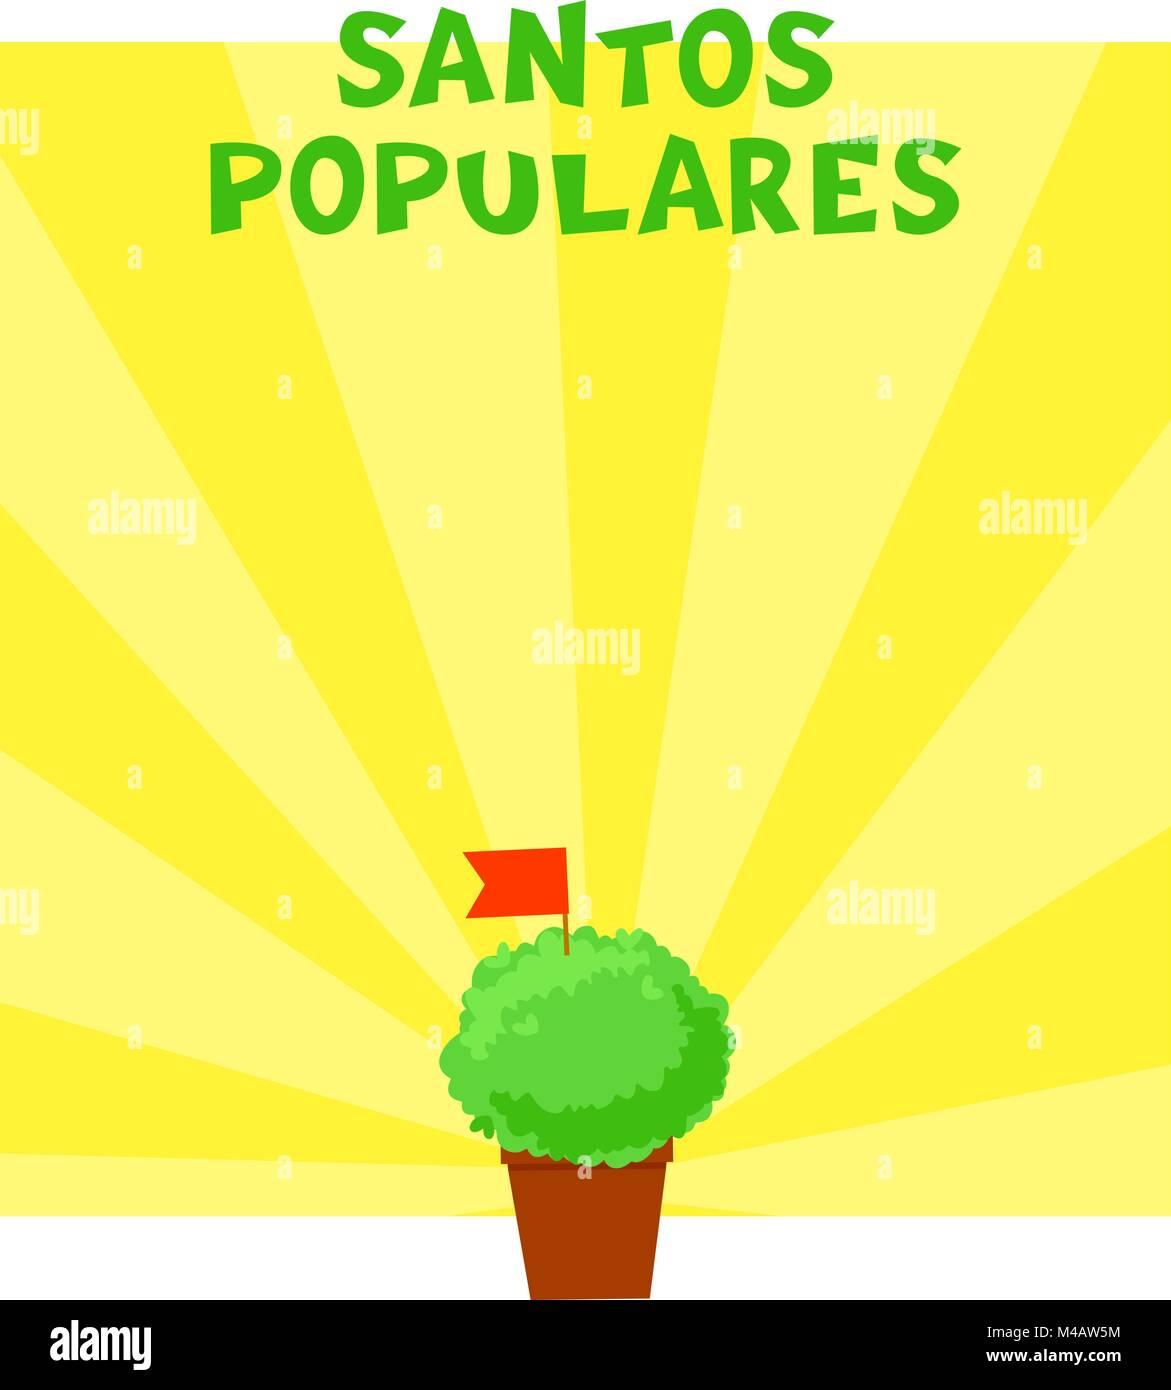 Postuguese Santos Populares banner - Stock Vector